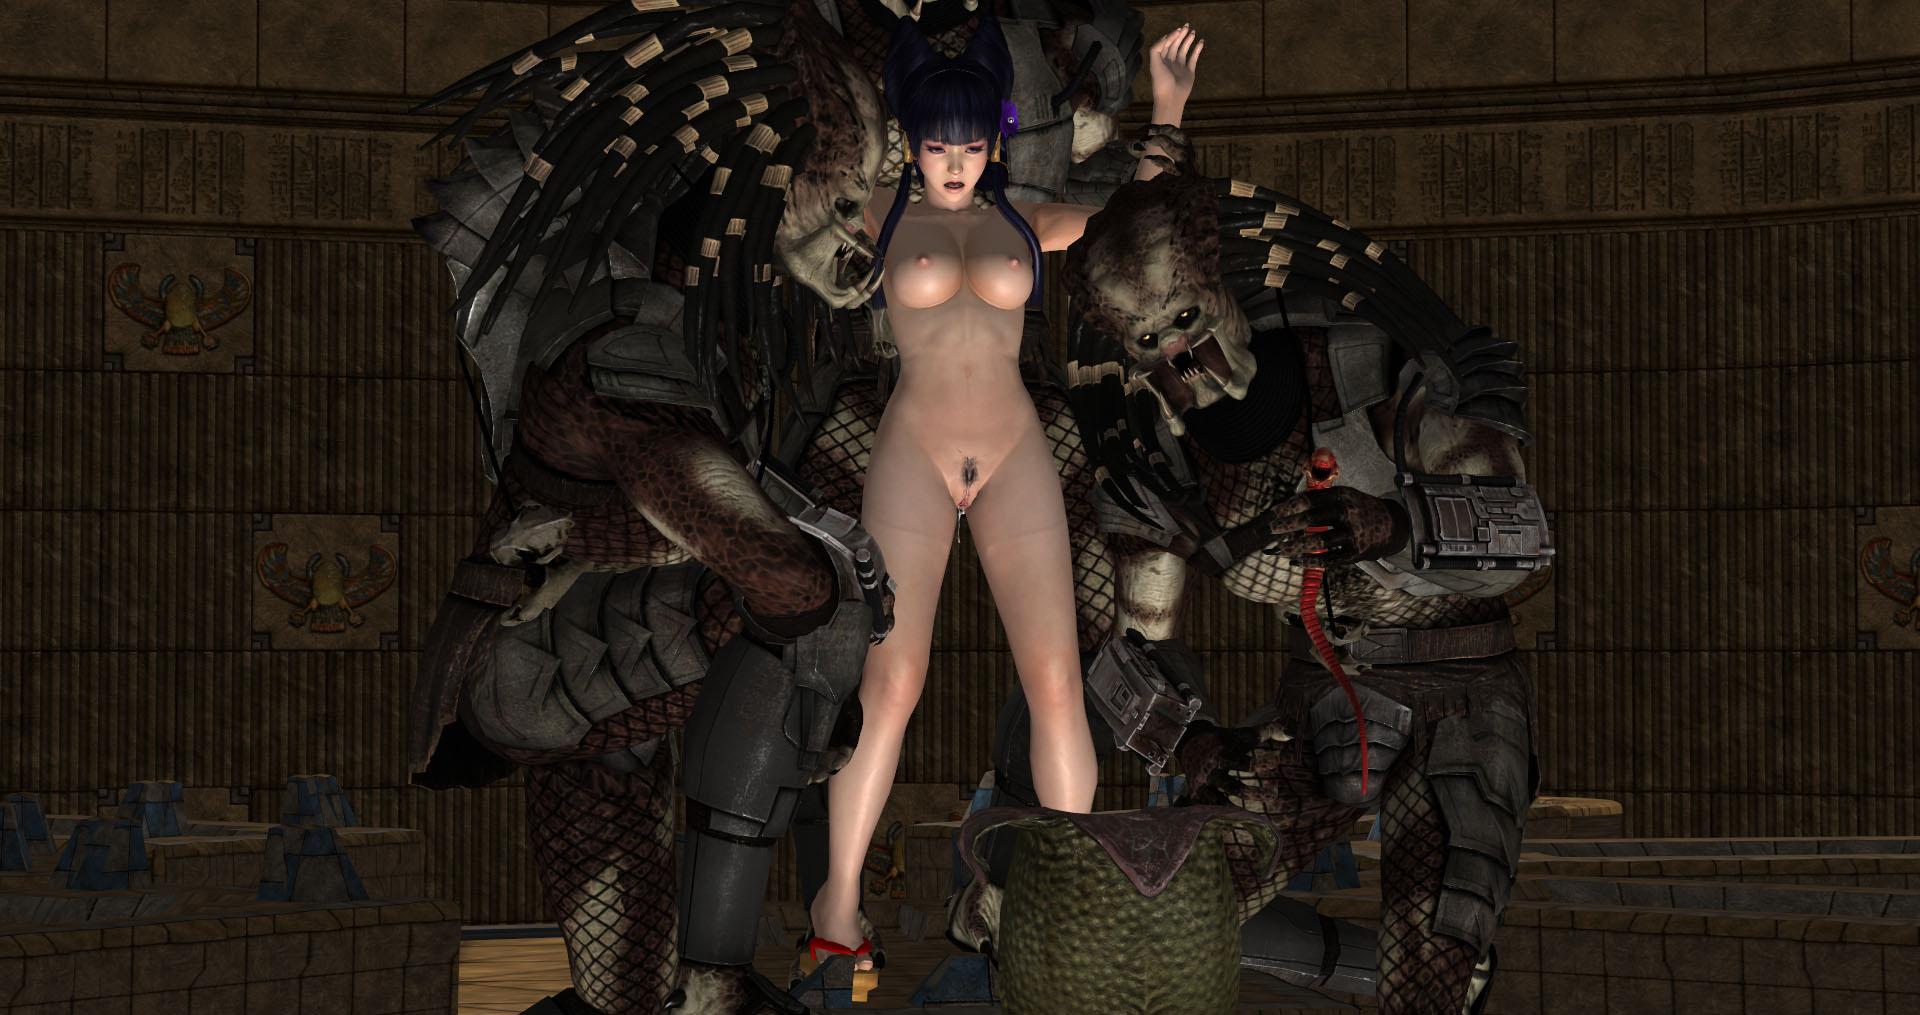 nyotengu_sacrifice_to_pussy_hugger_0005_layer_81_by_bitemonsters-dbgzcnb.jpg